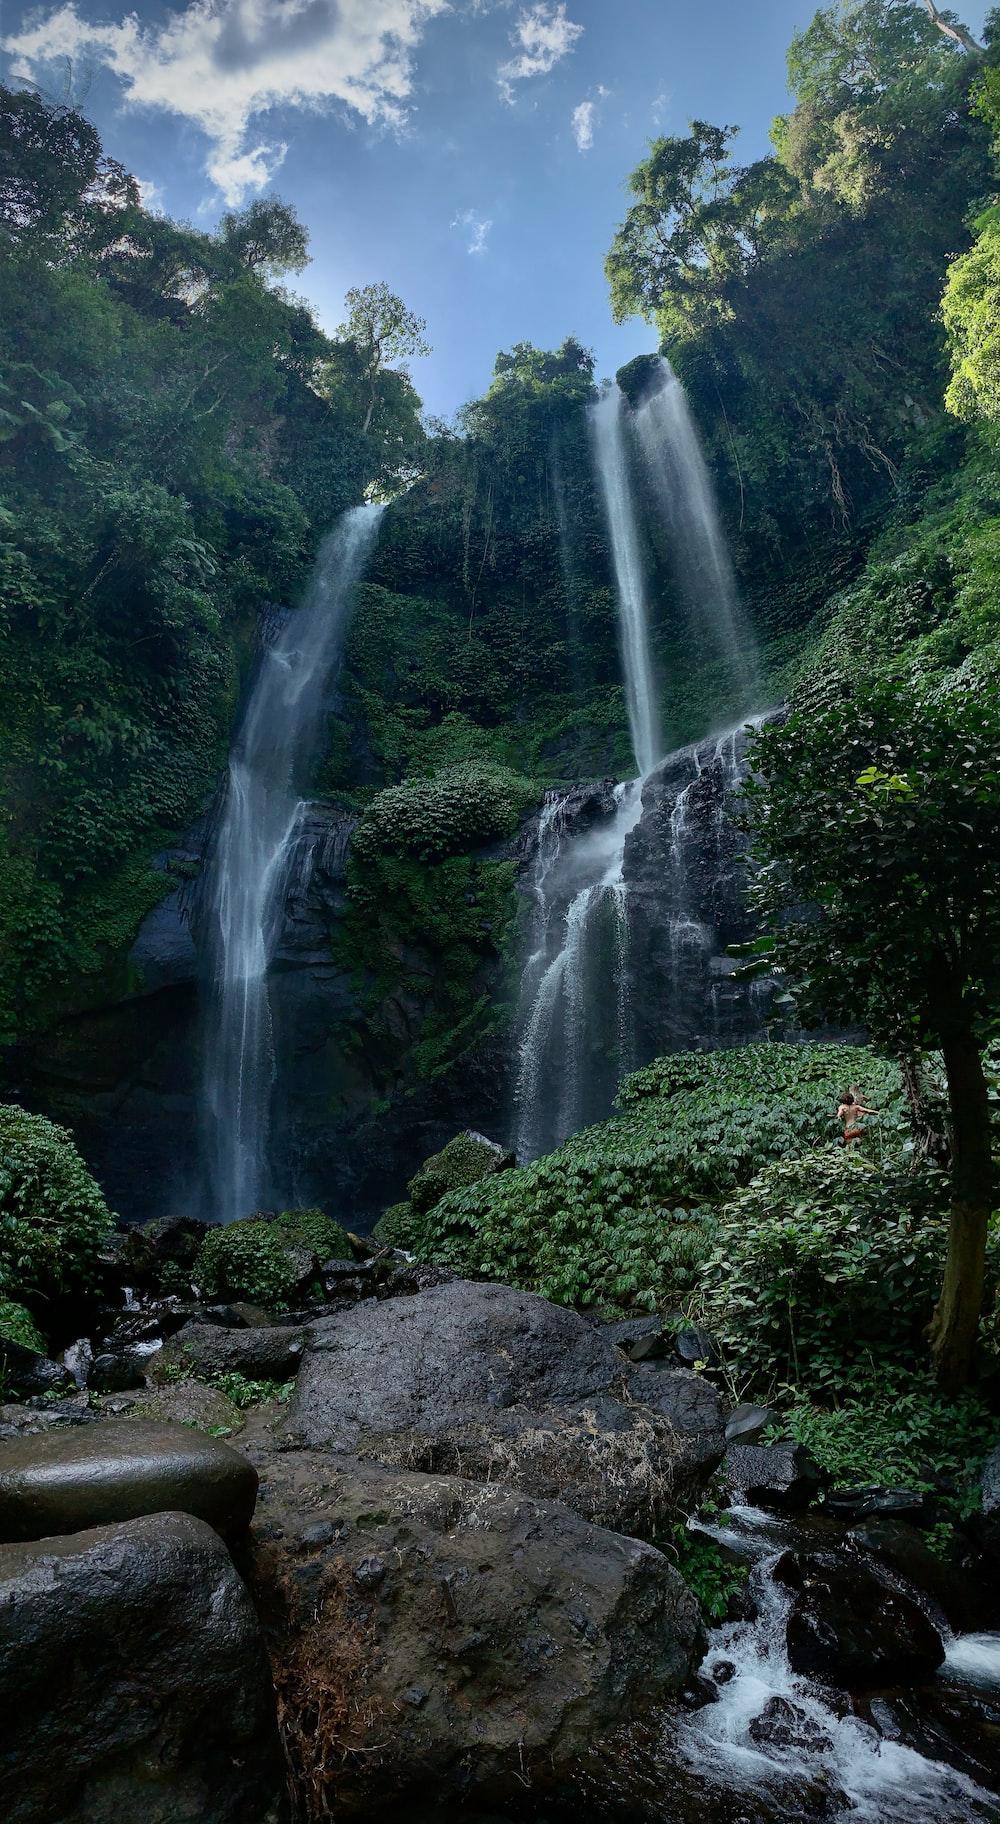 waterfalls on rocky ground during daytime